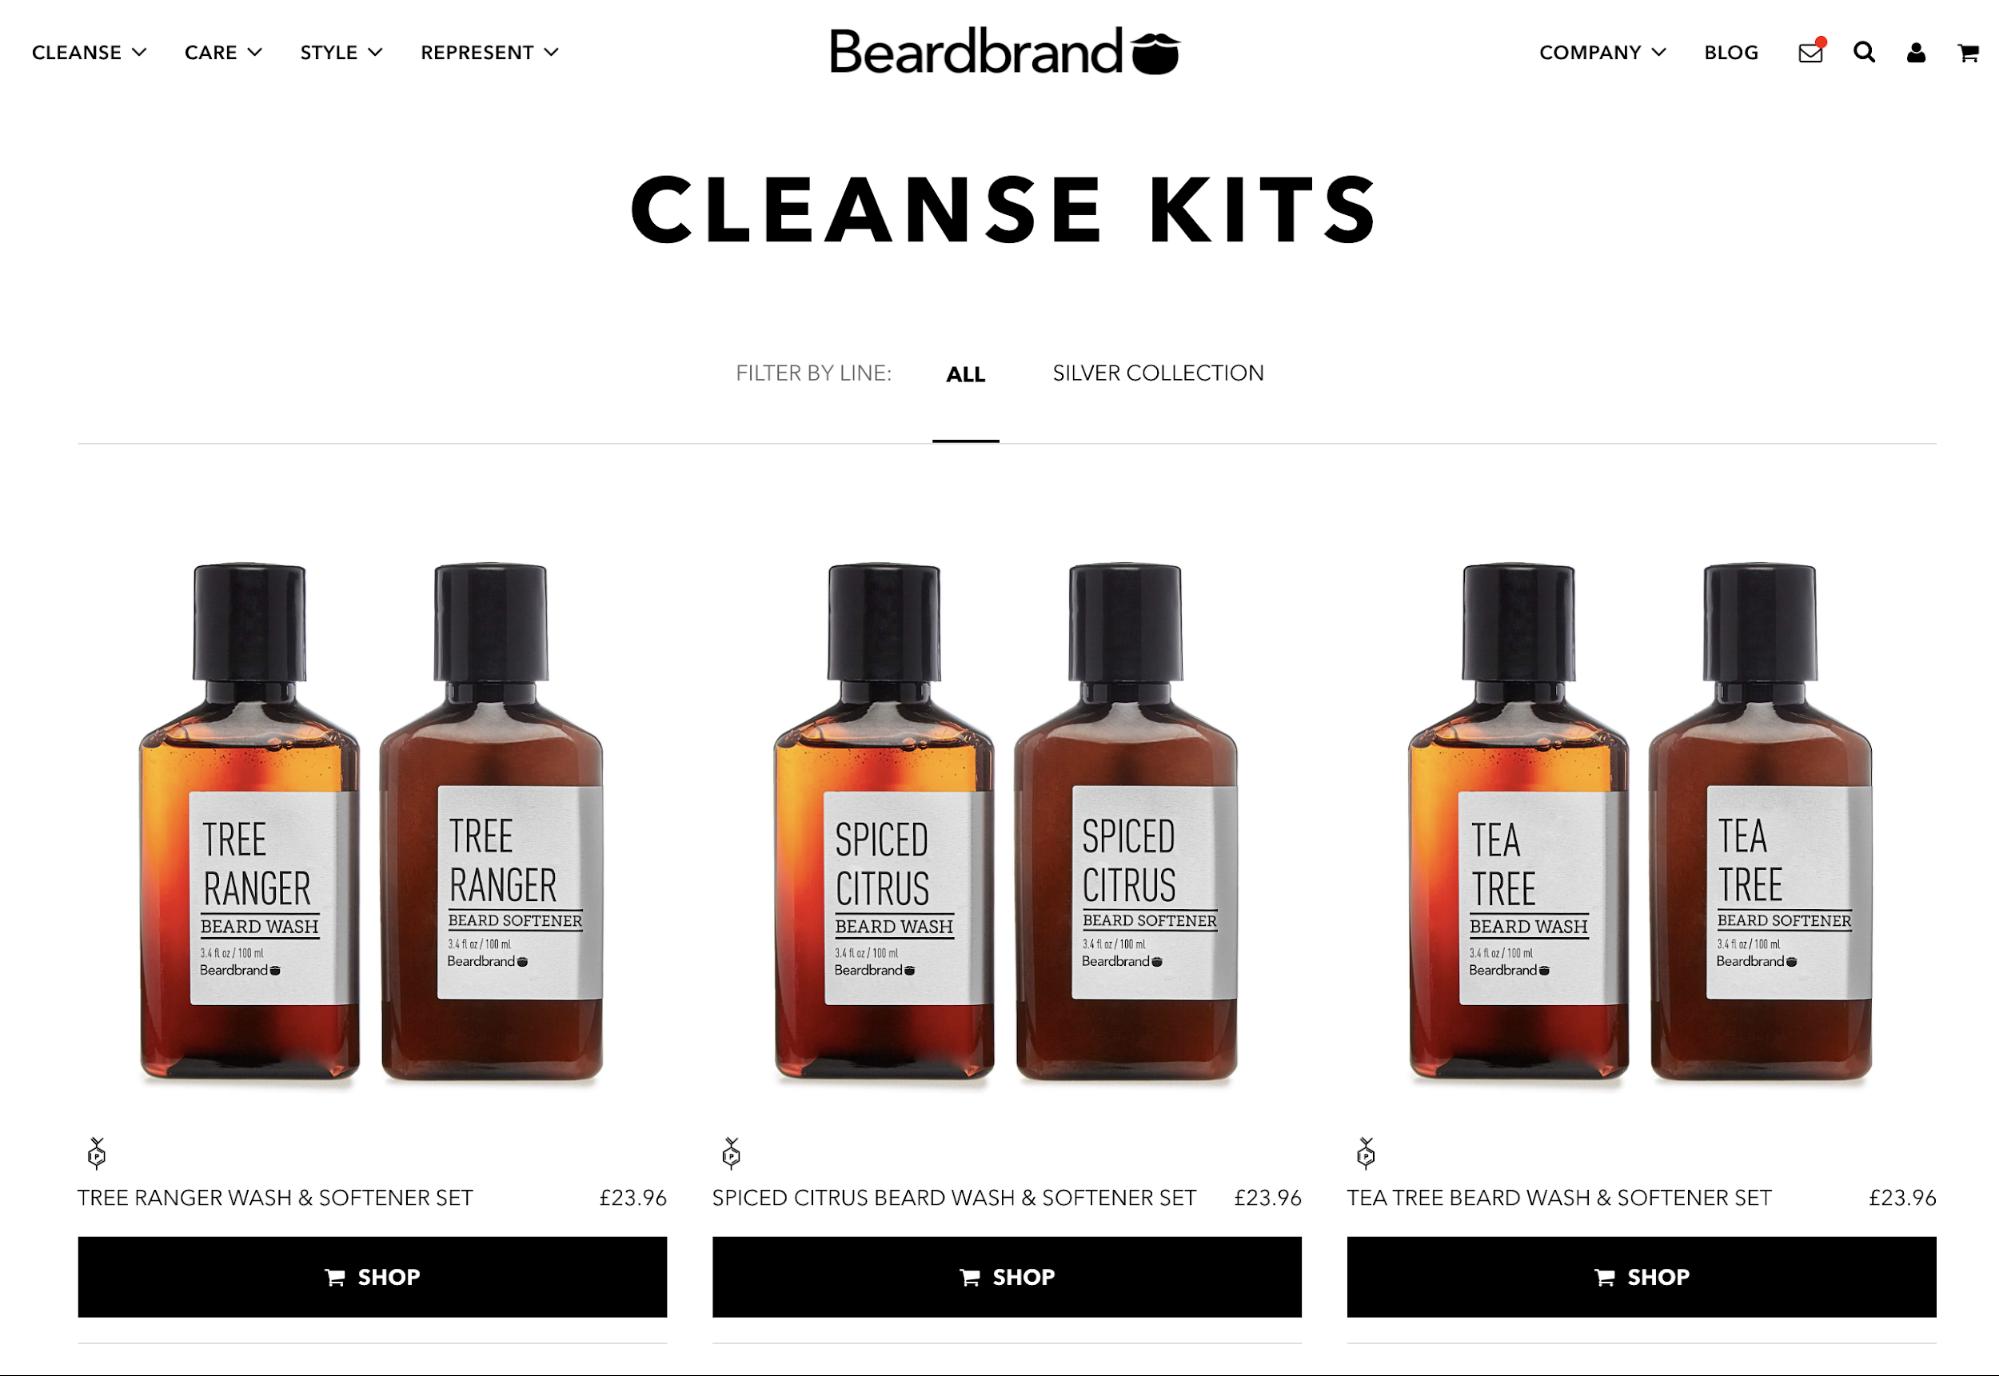 Screenshot showing cleanse kits on Beardbrand